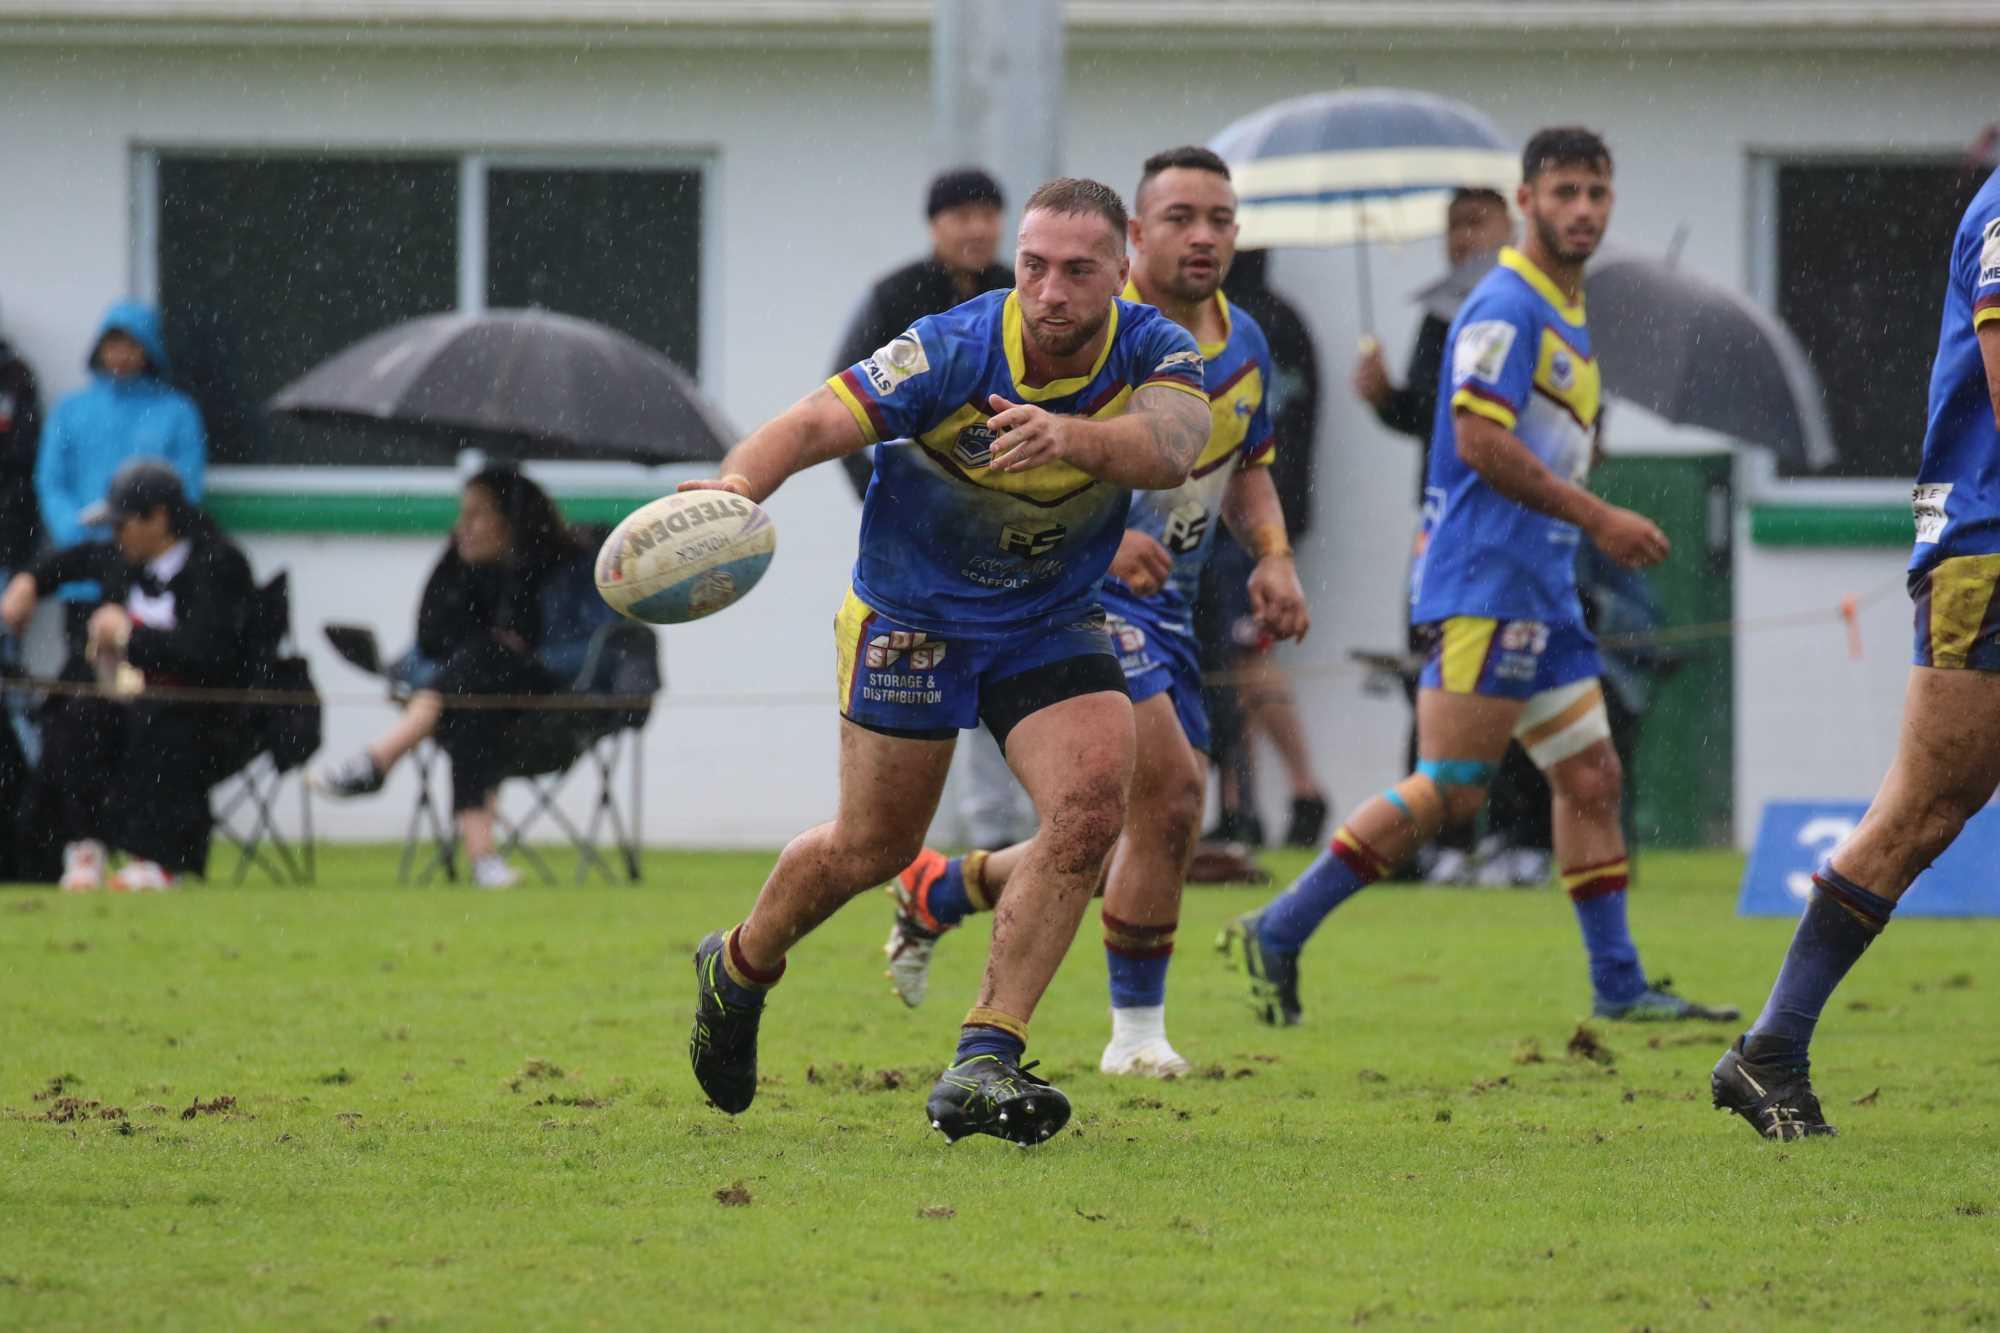 2021 Auckland Fox Memorial Premiership Qualifiers kick off on Saturday